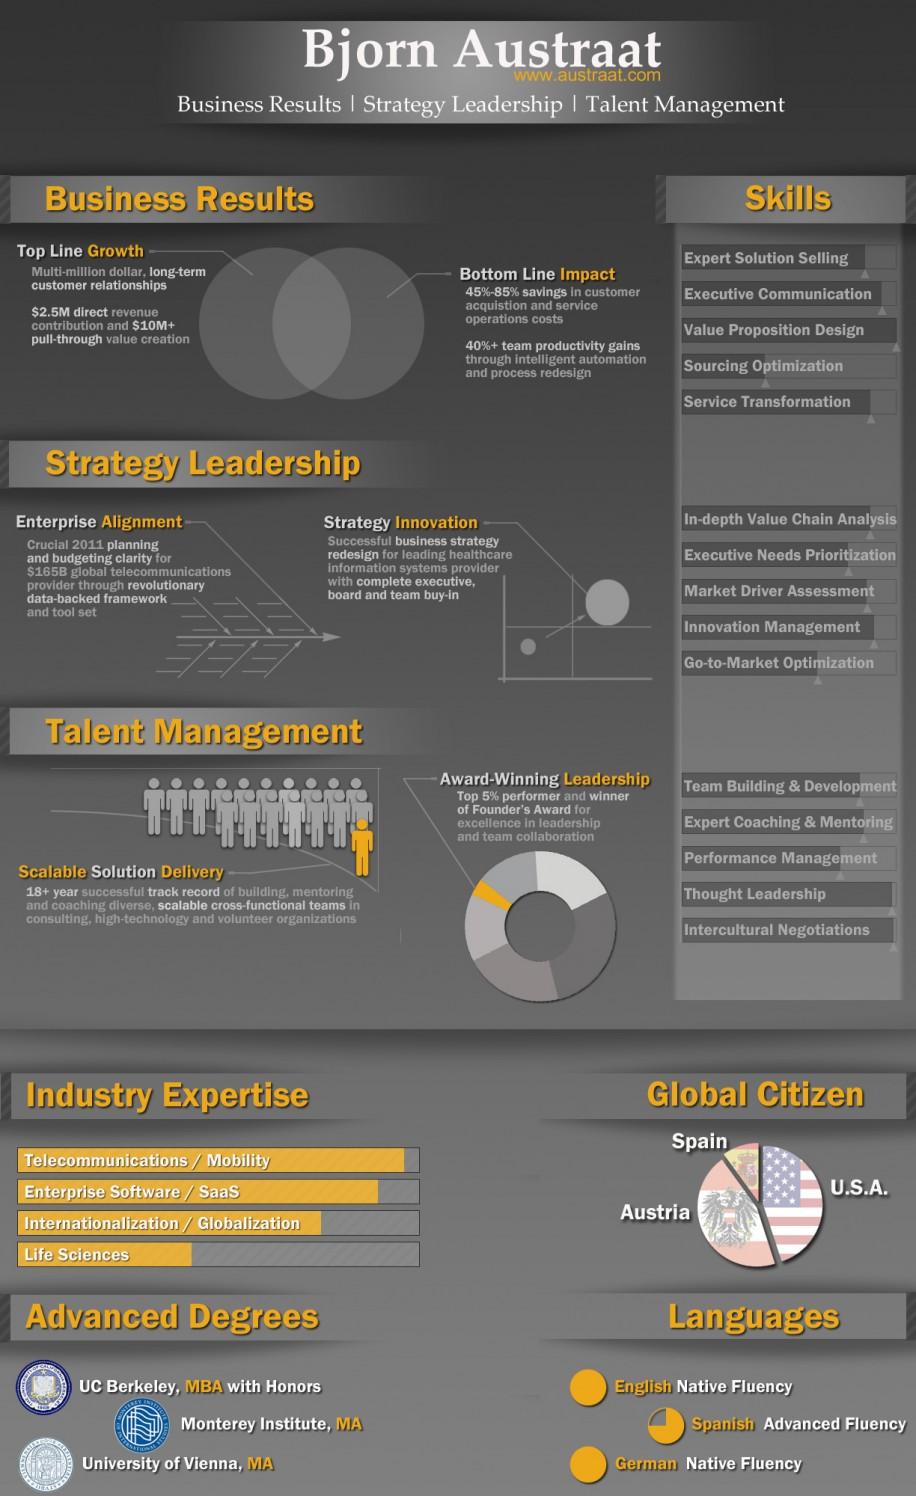 Kreative Darstellung – Lebenslauf als Infografik – Bootstrapping.me